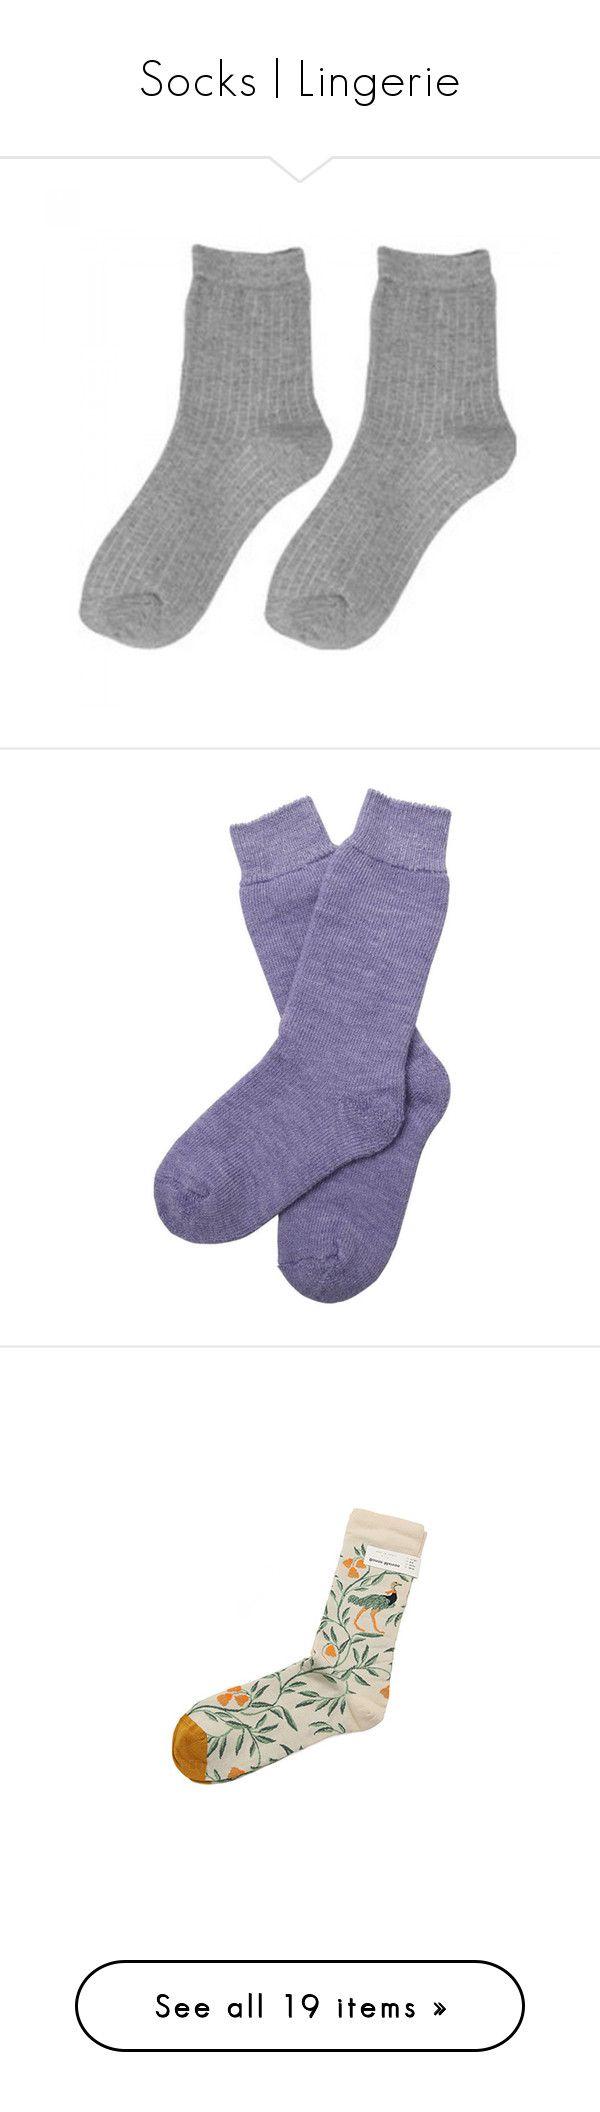 """Socks | Lingerie"" by jar-of-hearts-xx ❤ liked on Polyvore featuring intimates, hosiery, socks, accessories - socks, clothing - socks, fillers, accessories, terry socks, purple socks and barbour"